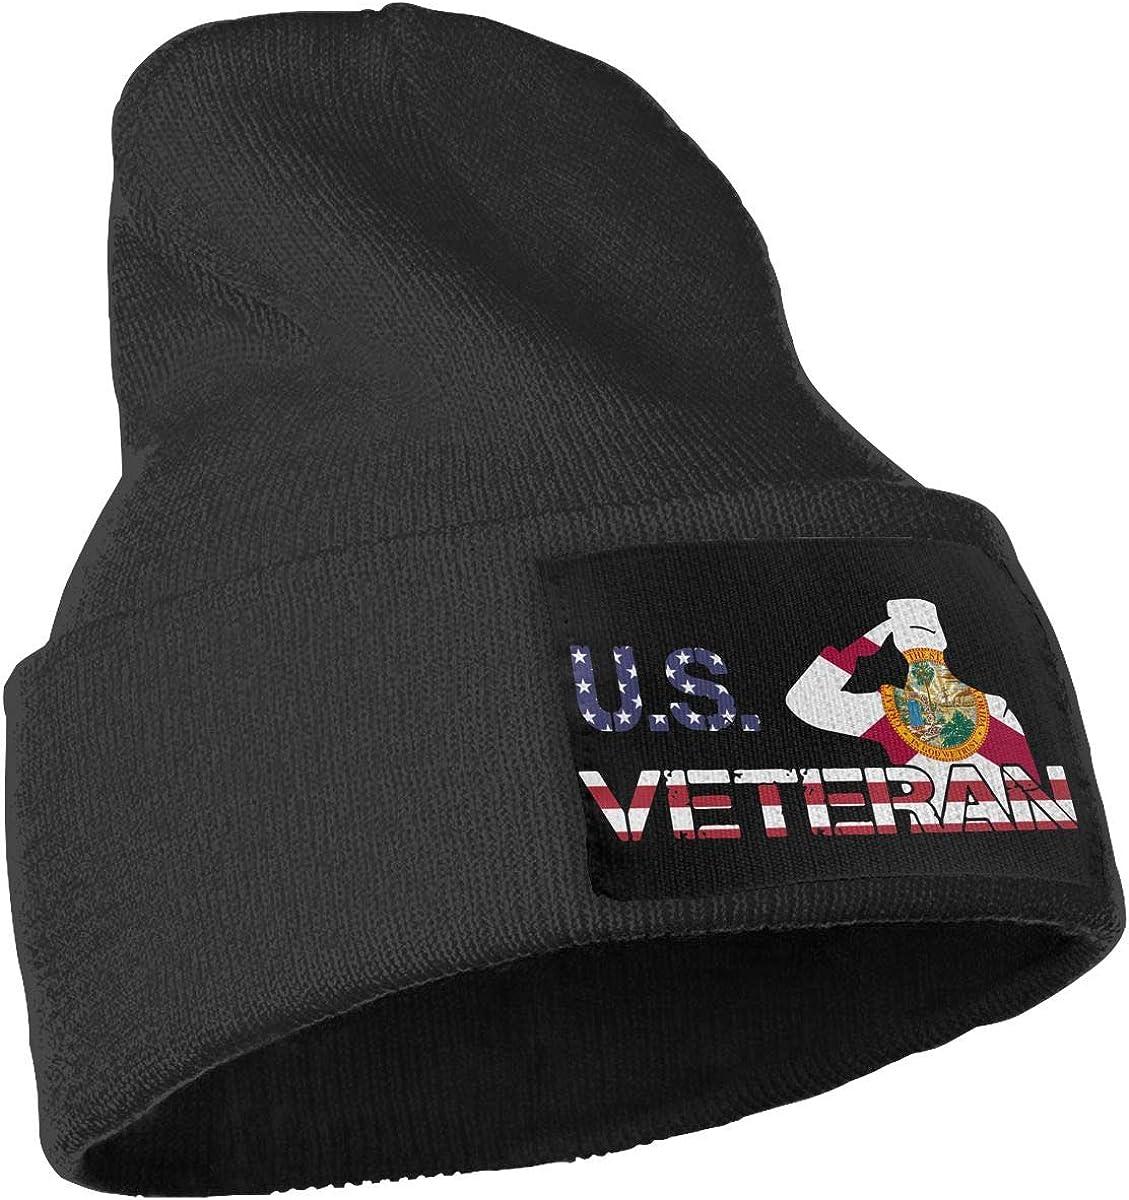 COLLJL-8 Men /& Women American Veterans Day Florida Flag Outdoor Stretch Knit Beanies Hat Soft Winter Skull Caps